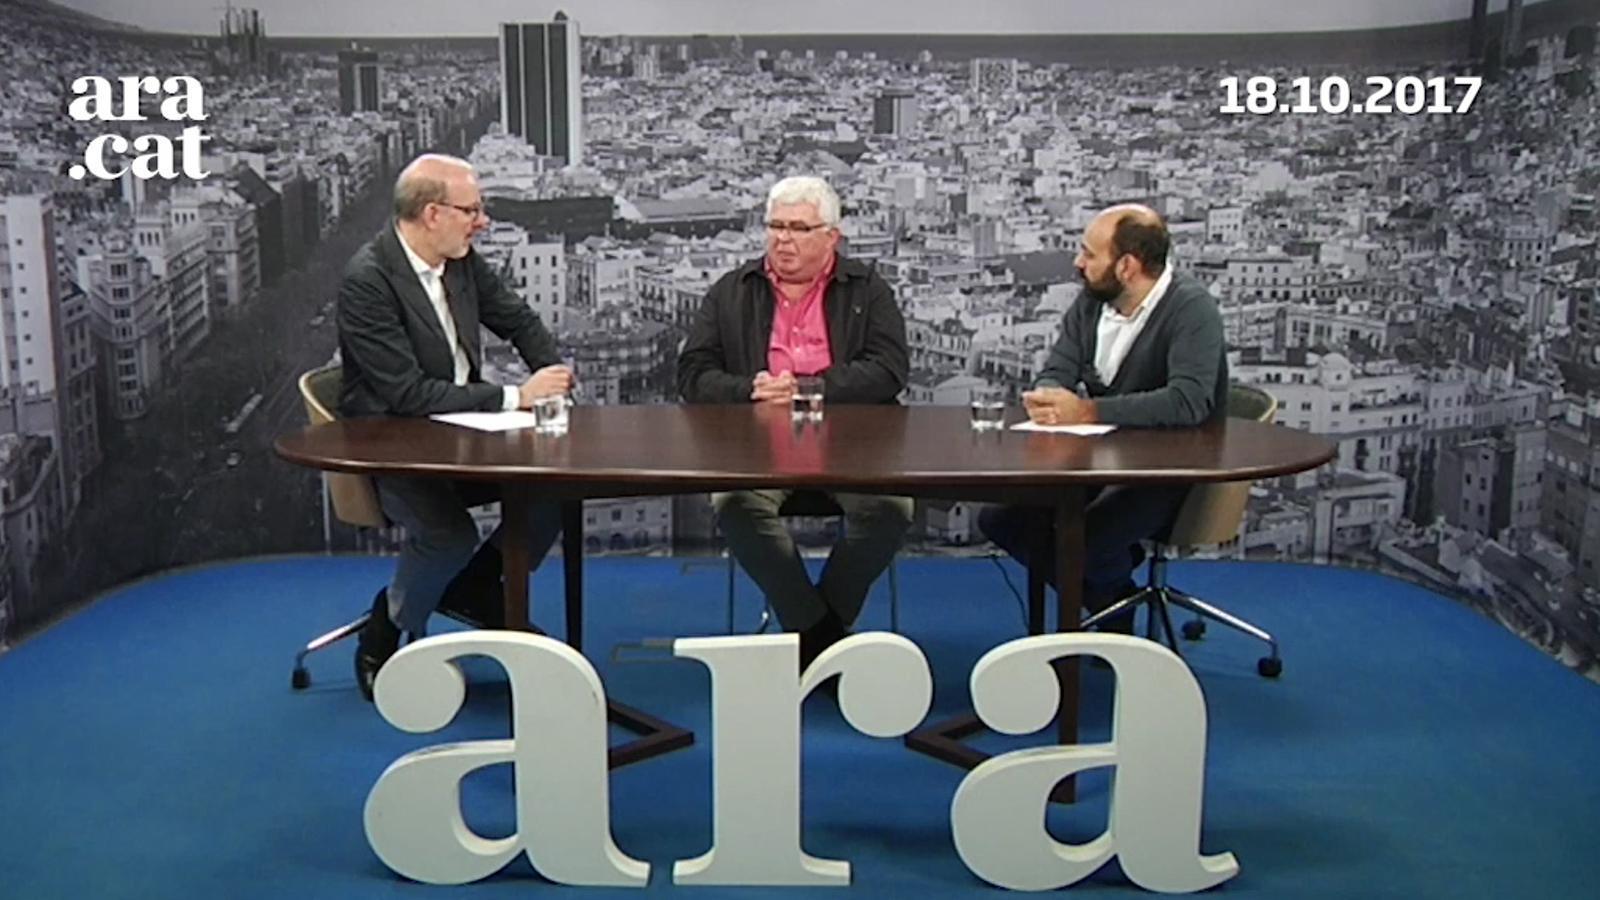 Entrevista d'Antoni Bassas a Marcel Mauri i Agustí Alcoberro (18-10-2017)